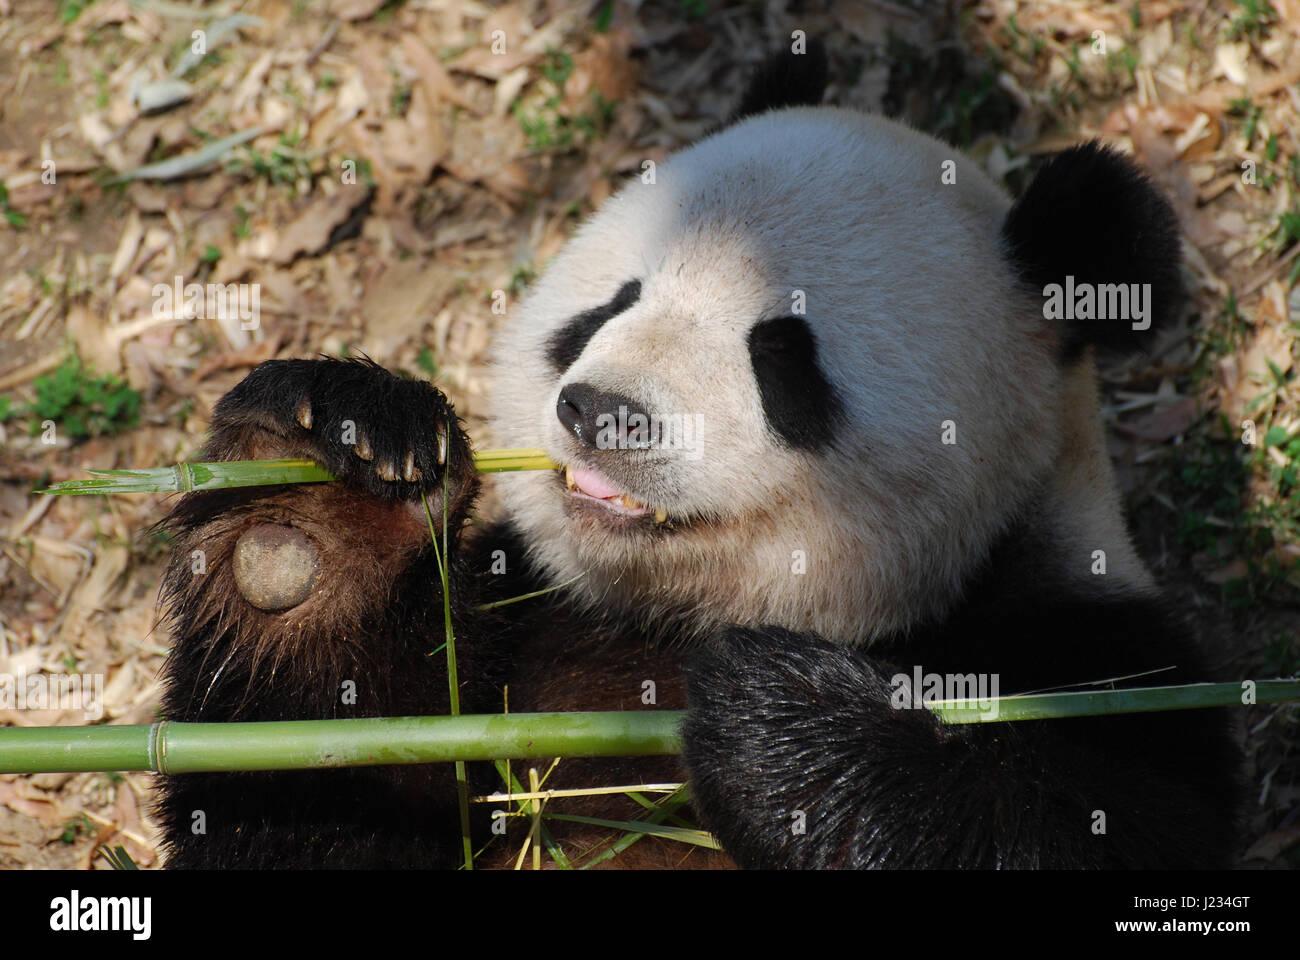 Big Panda, or Bamboo Bear: a description of where interesting facts live 87